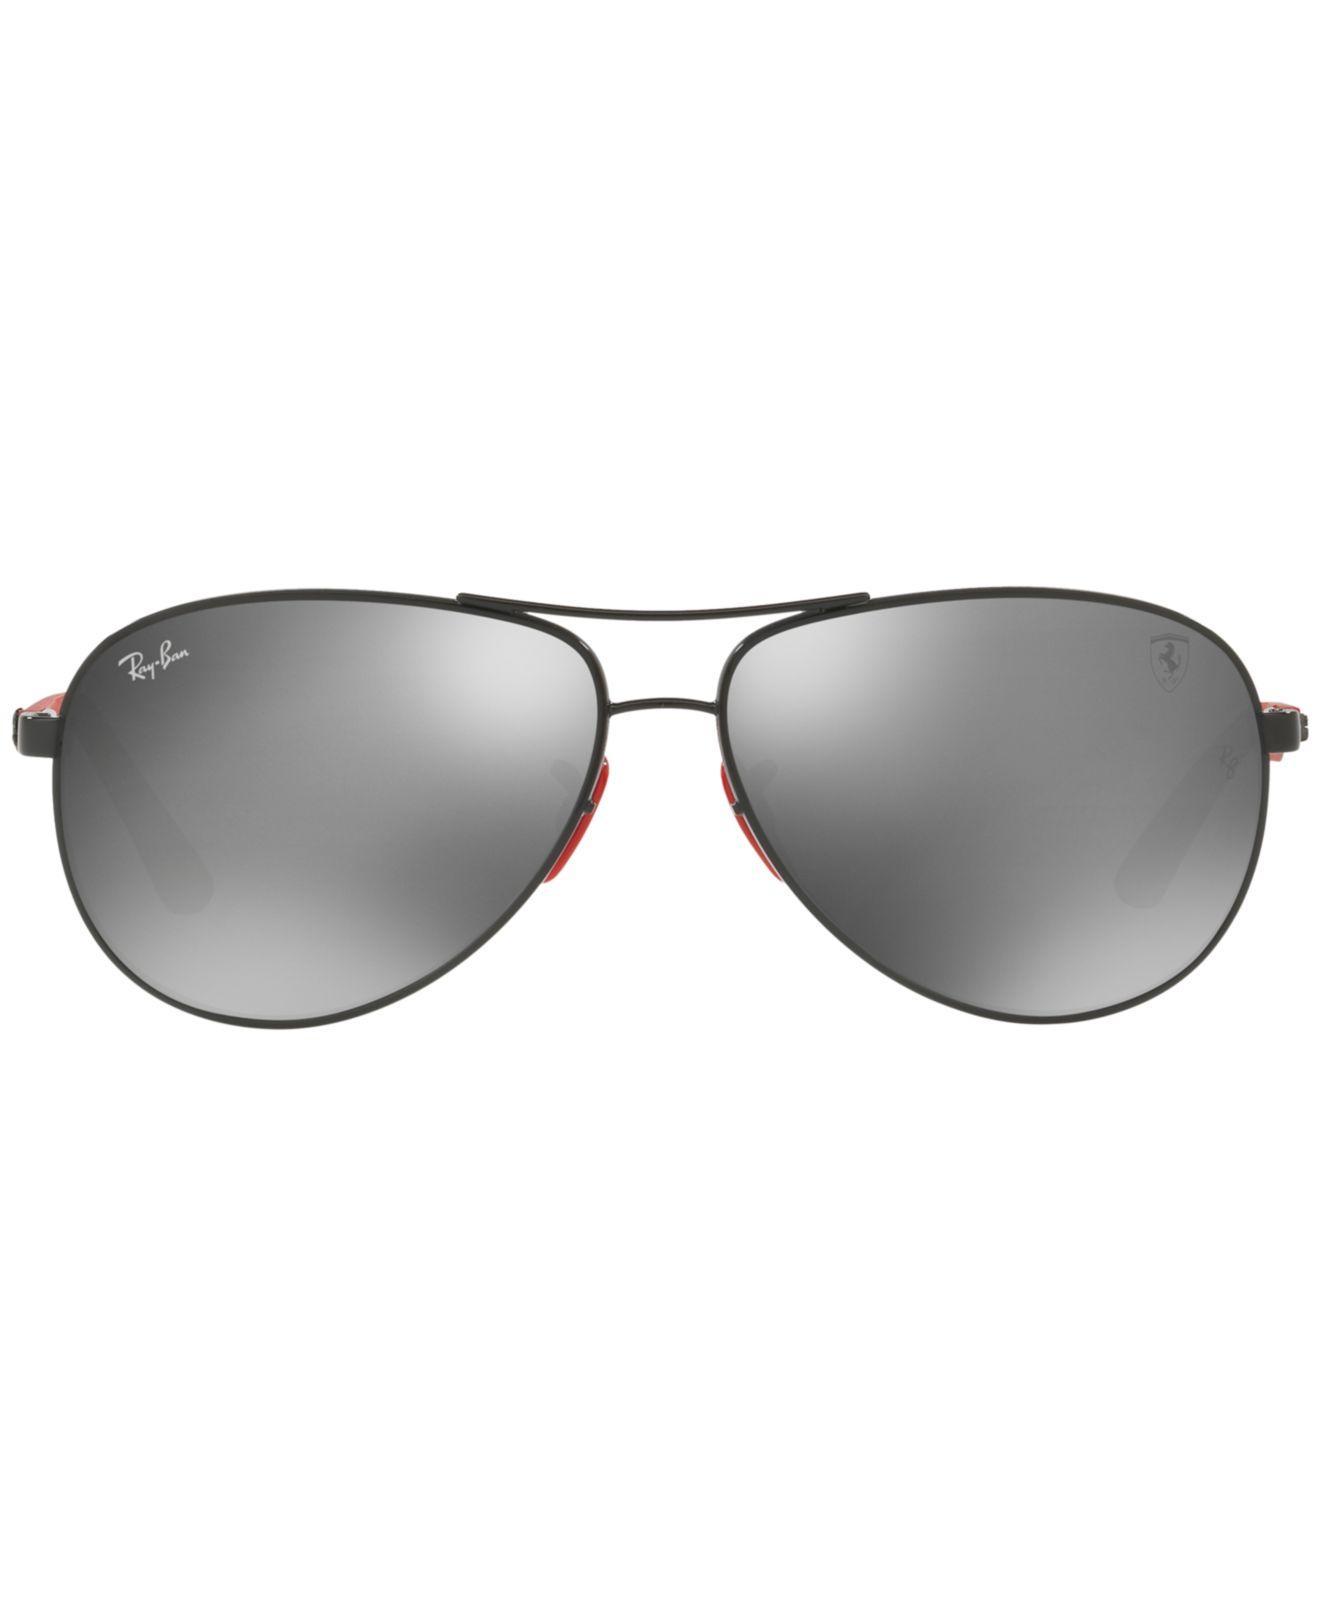 b44ae9fe97948 Lyst - Ray-Ban Sunglasses